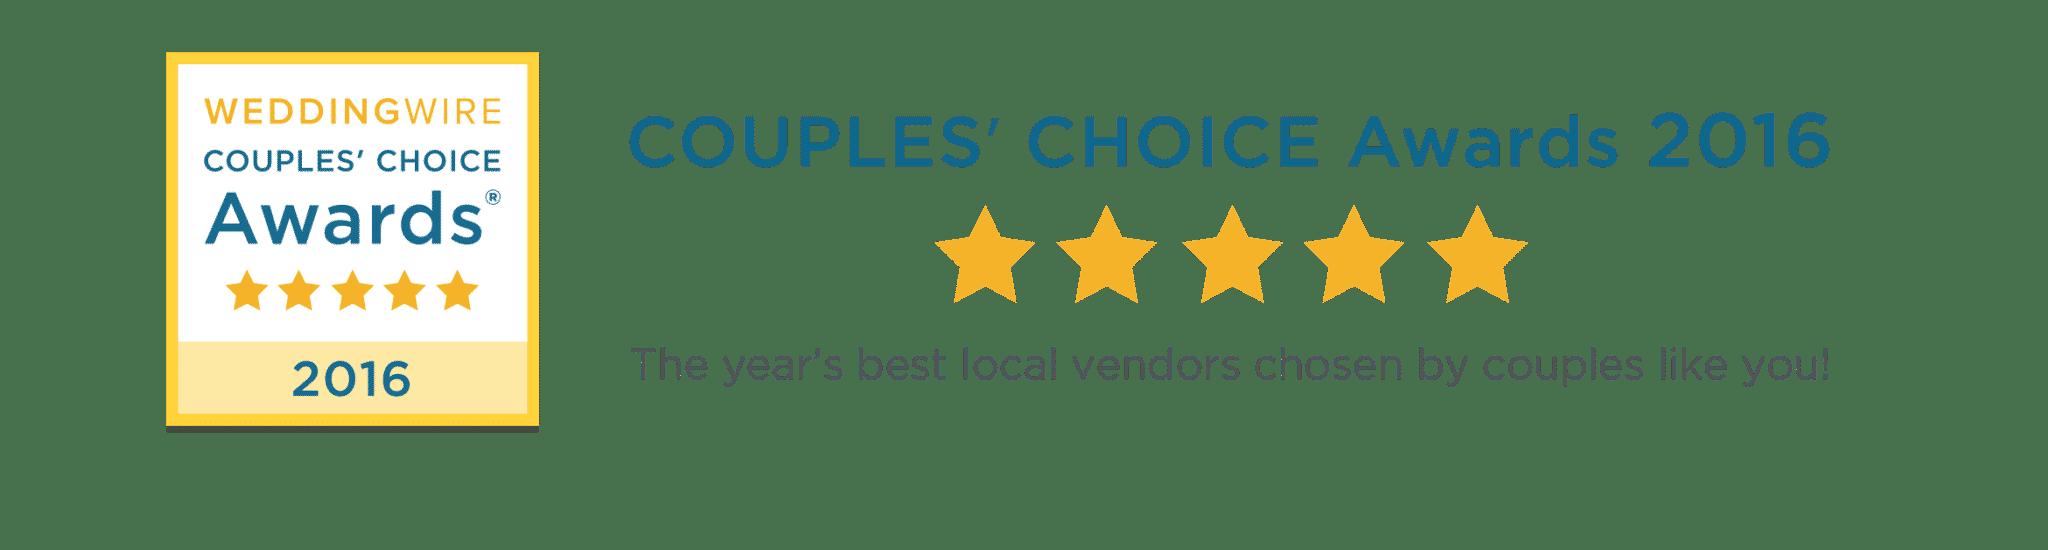 2016 WeddingWire Couples' Choice Award®